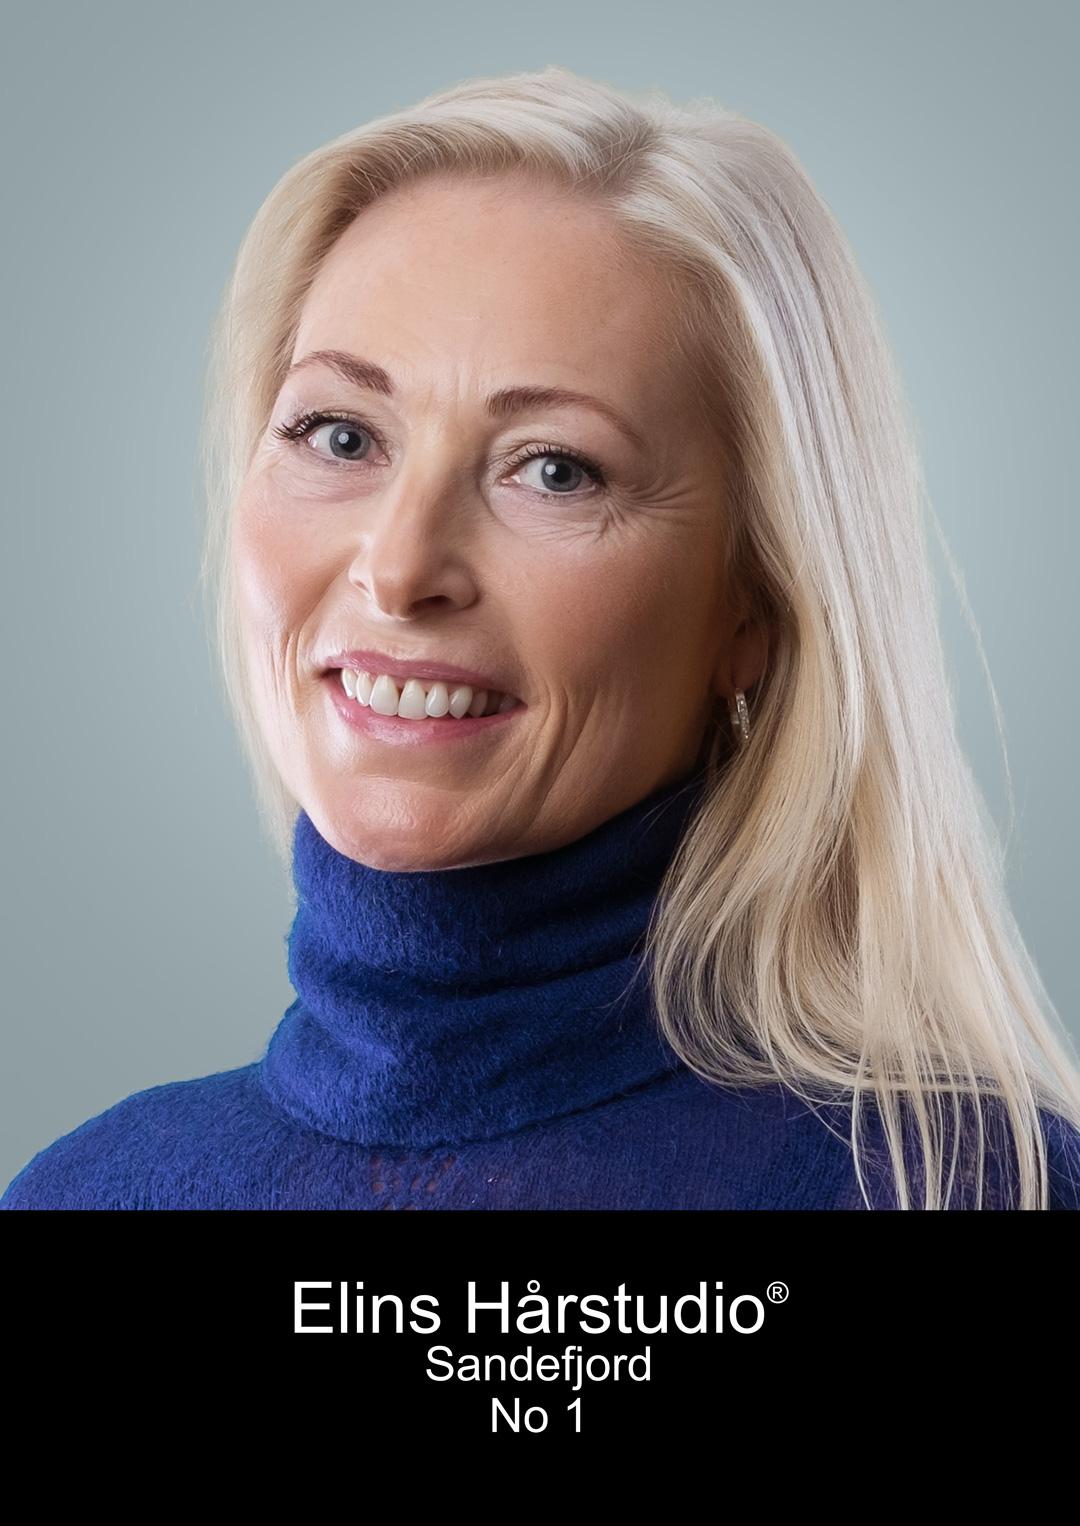 Frisør Sandefjord Stine Therese Haakonsen